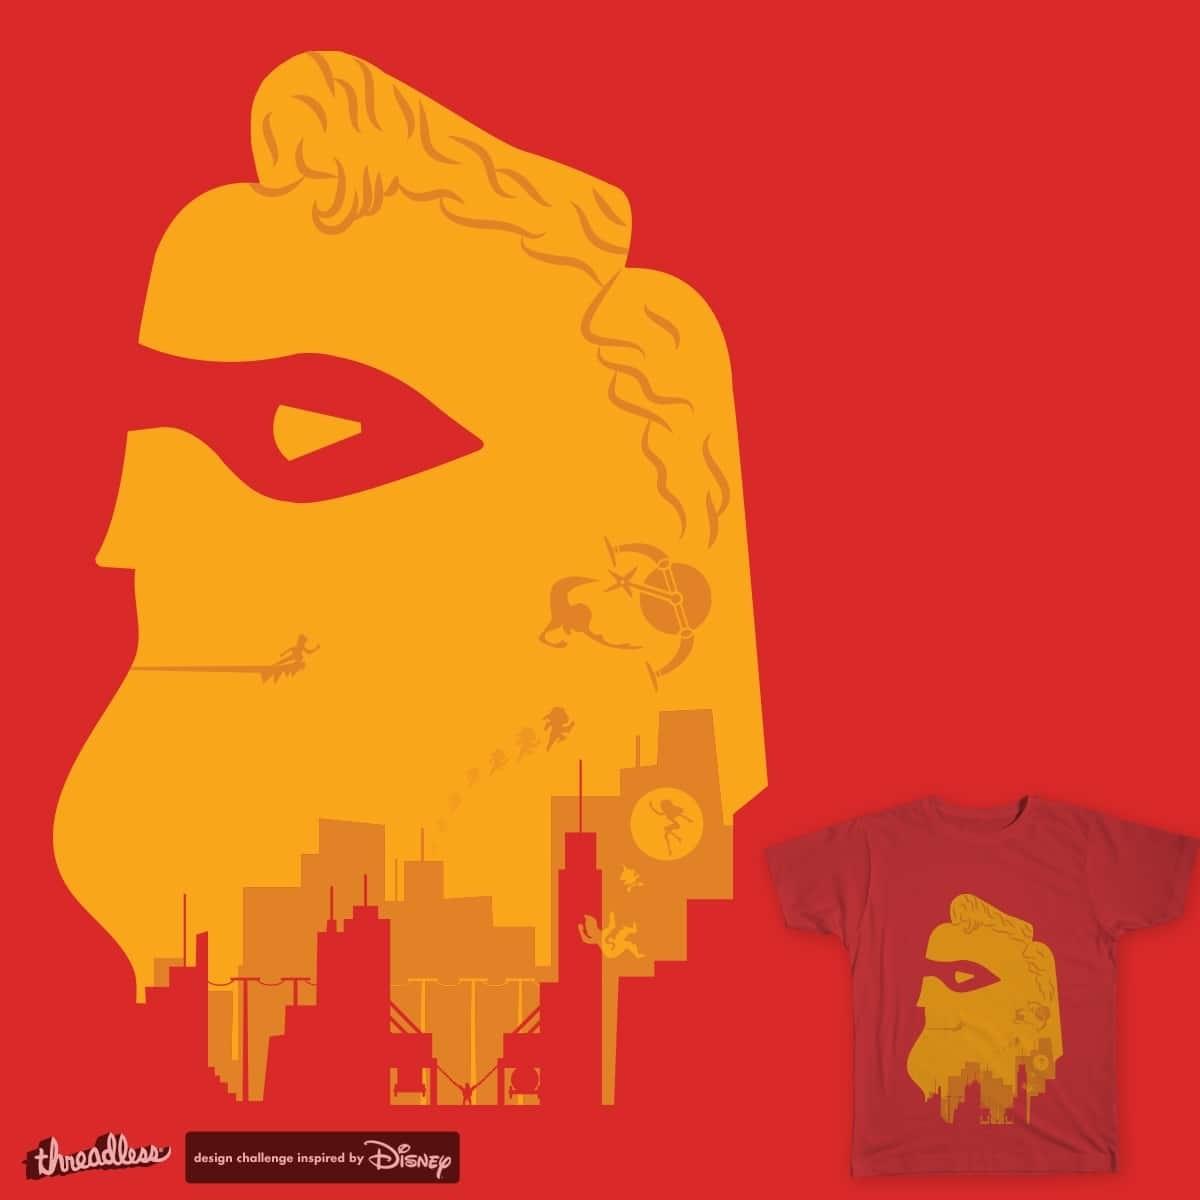 Mr Incredibly large head by GregSuj on Threadless